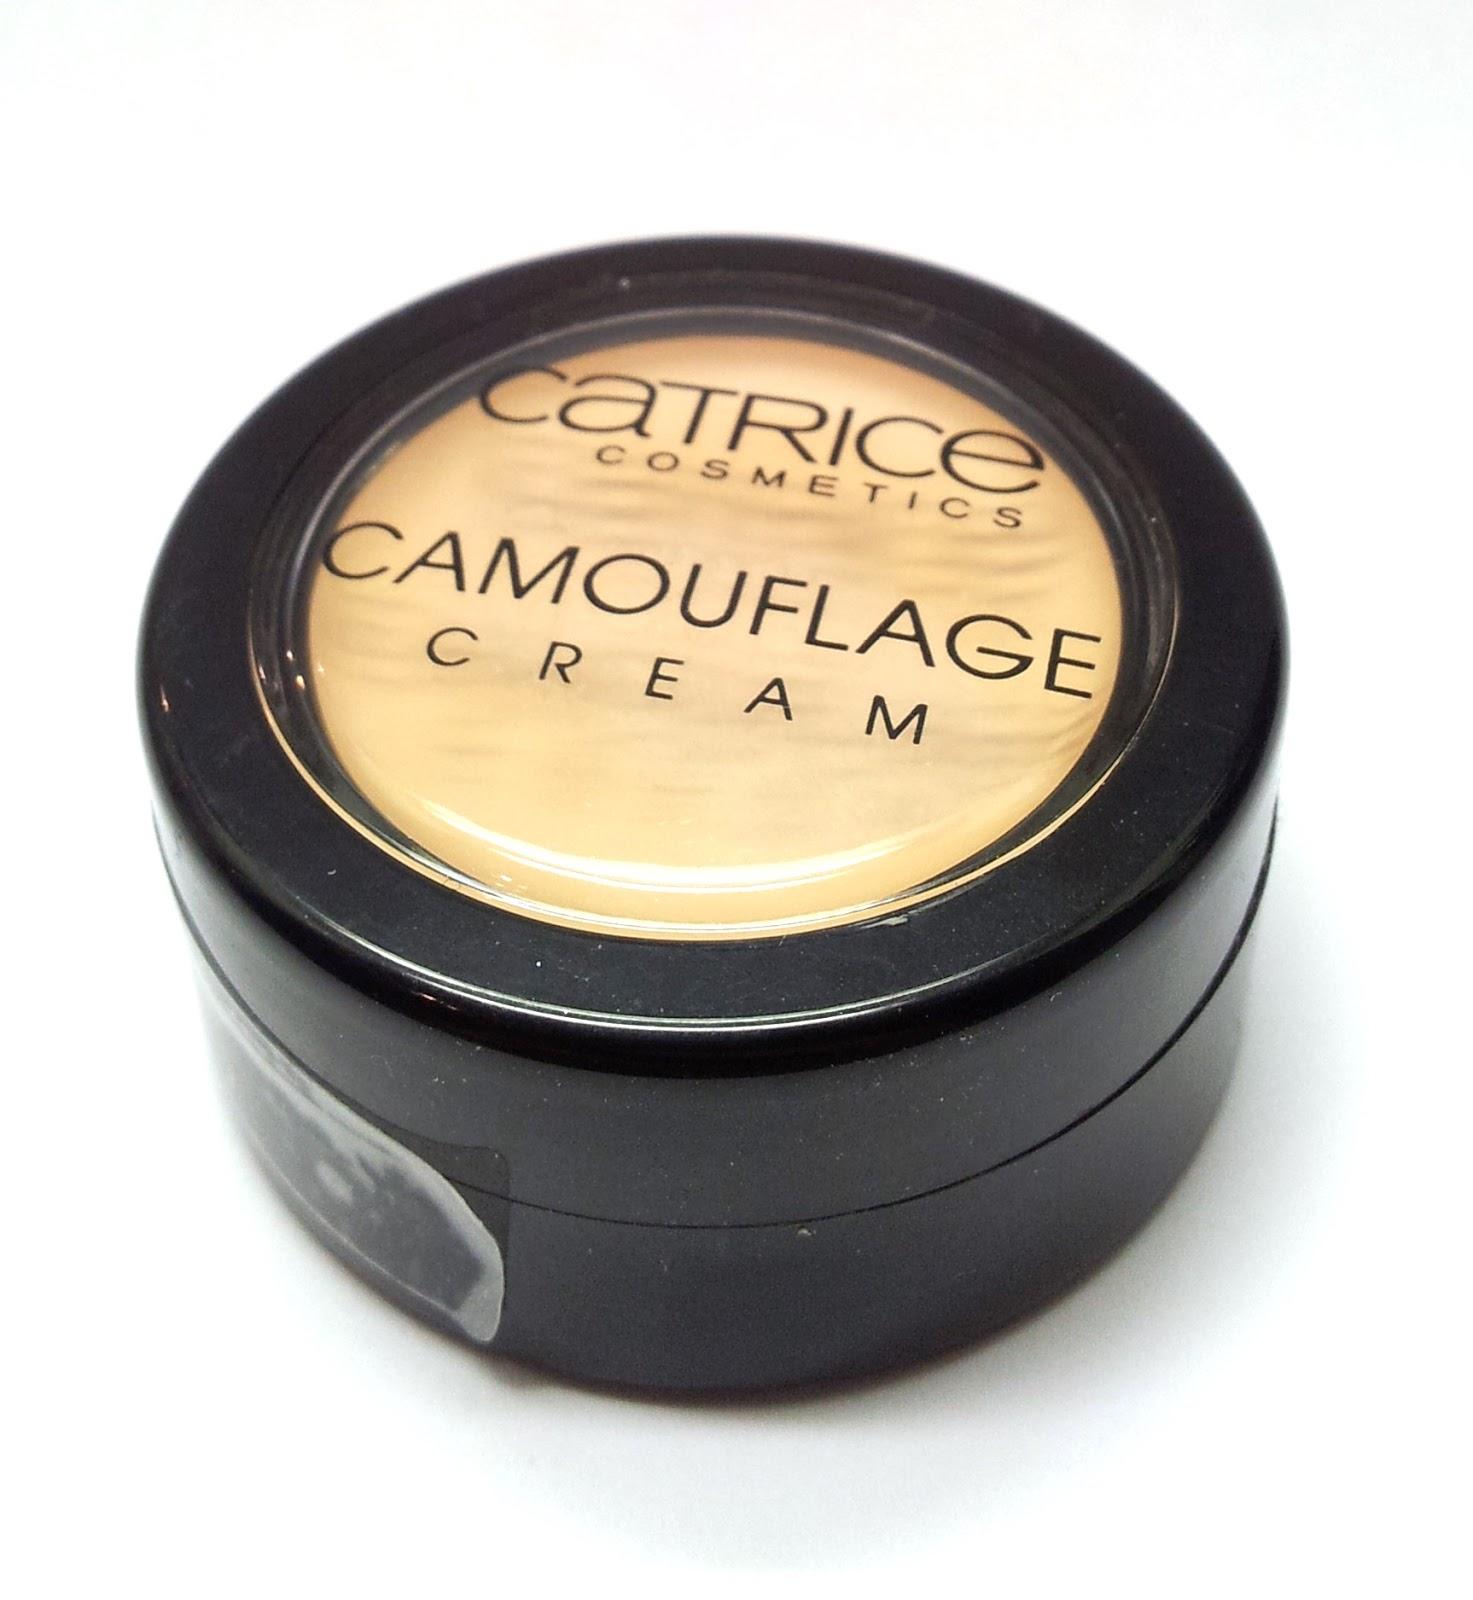 Catrice: Camouflage cream 010 Ivory